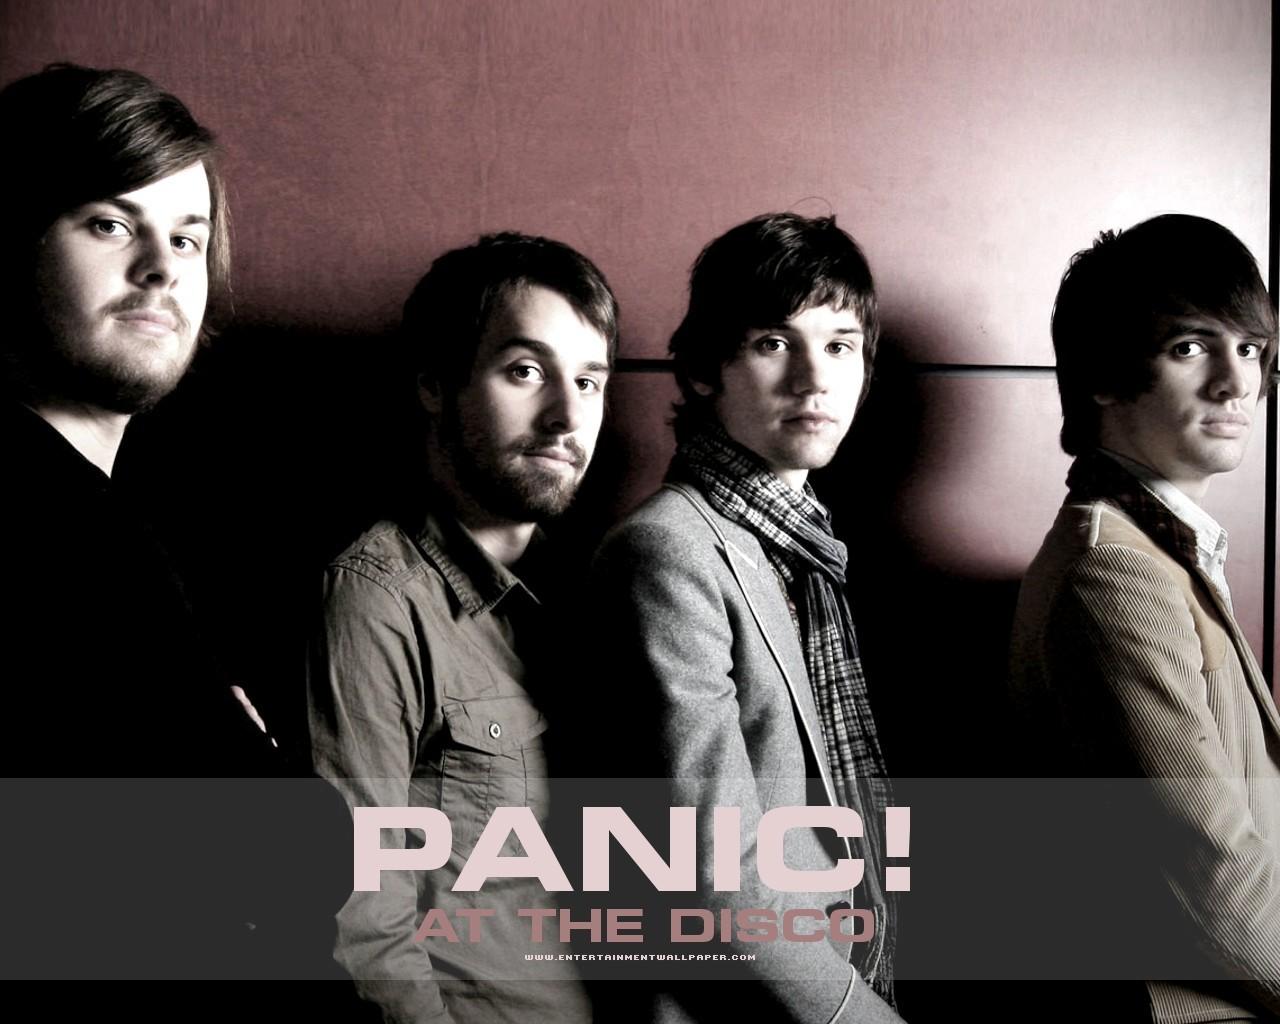 Panic at the Disco panic at the disco 947462 1280 1024jpg 1280x1024